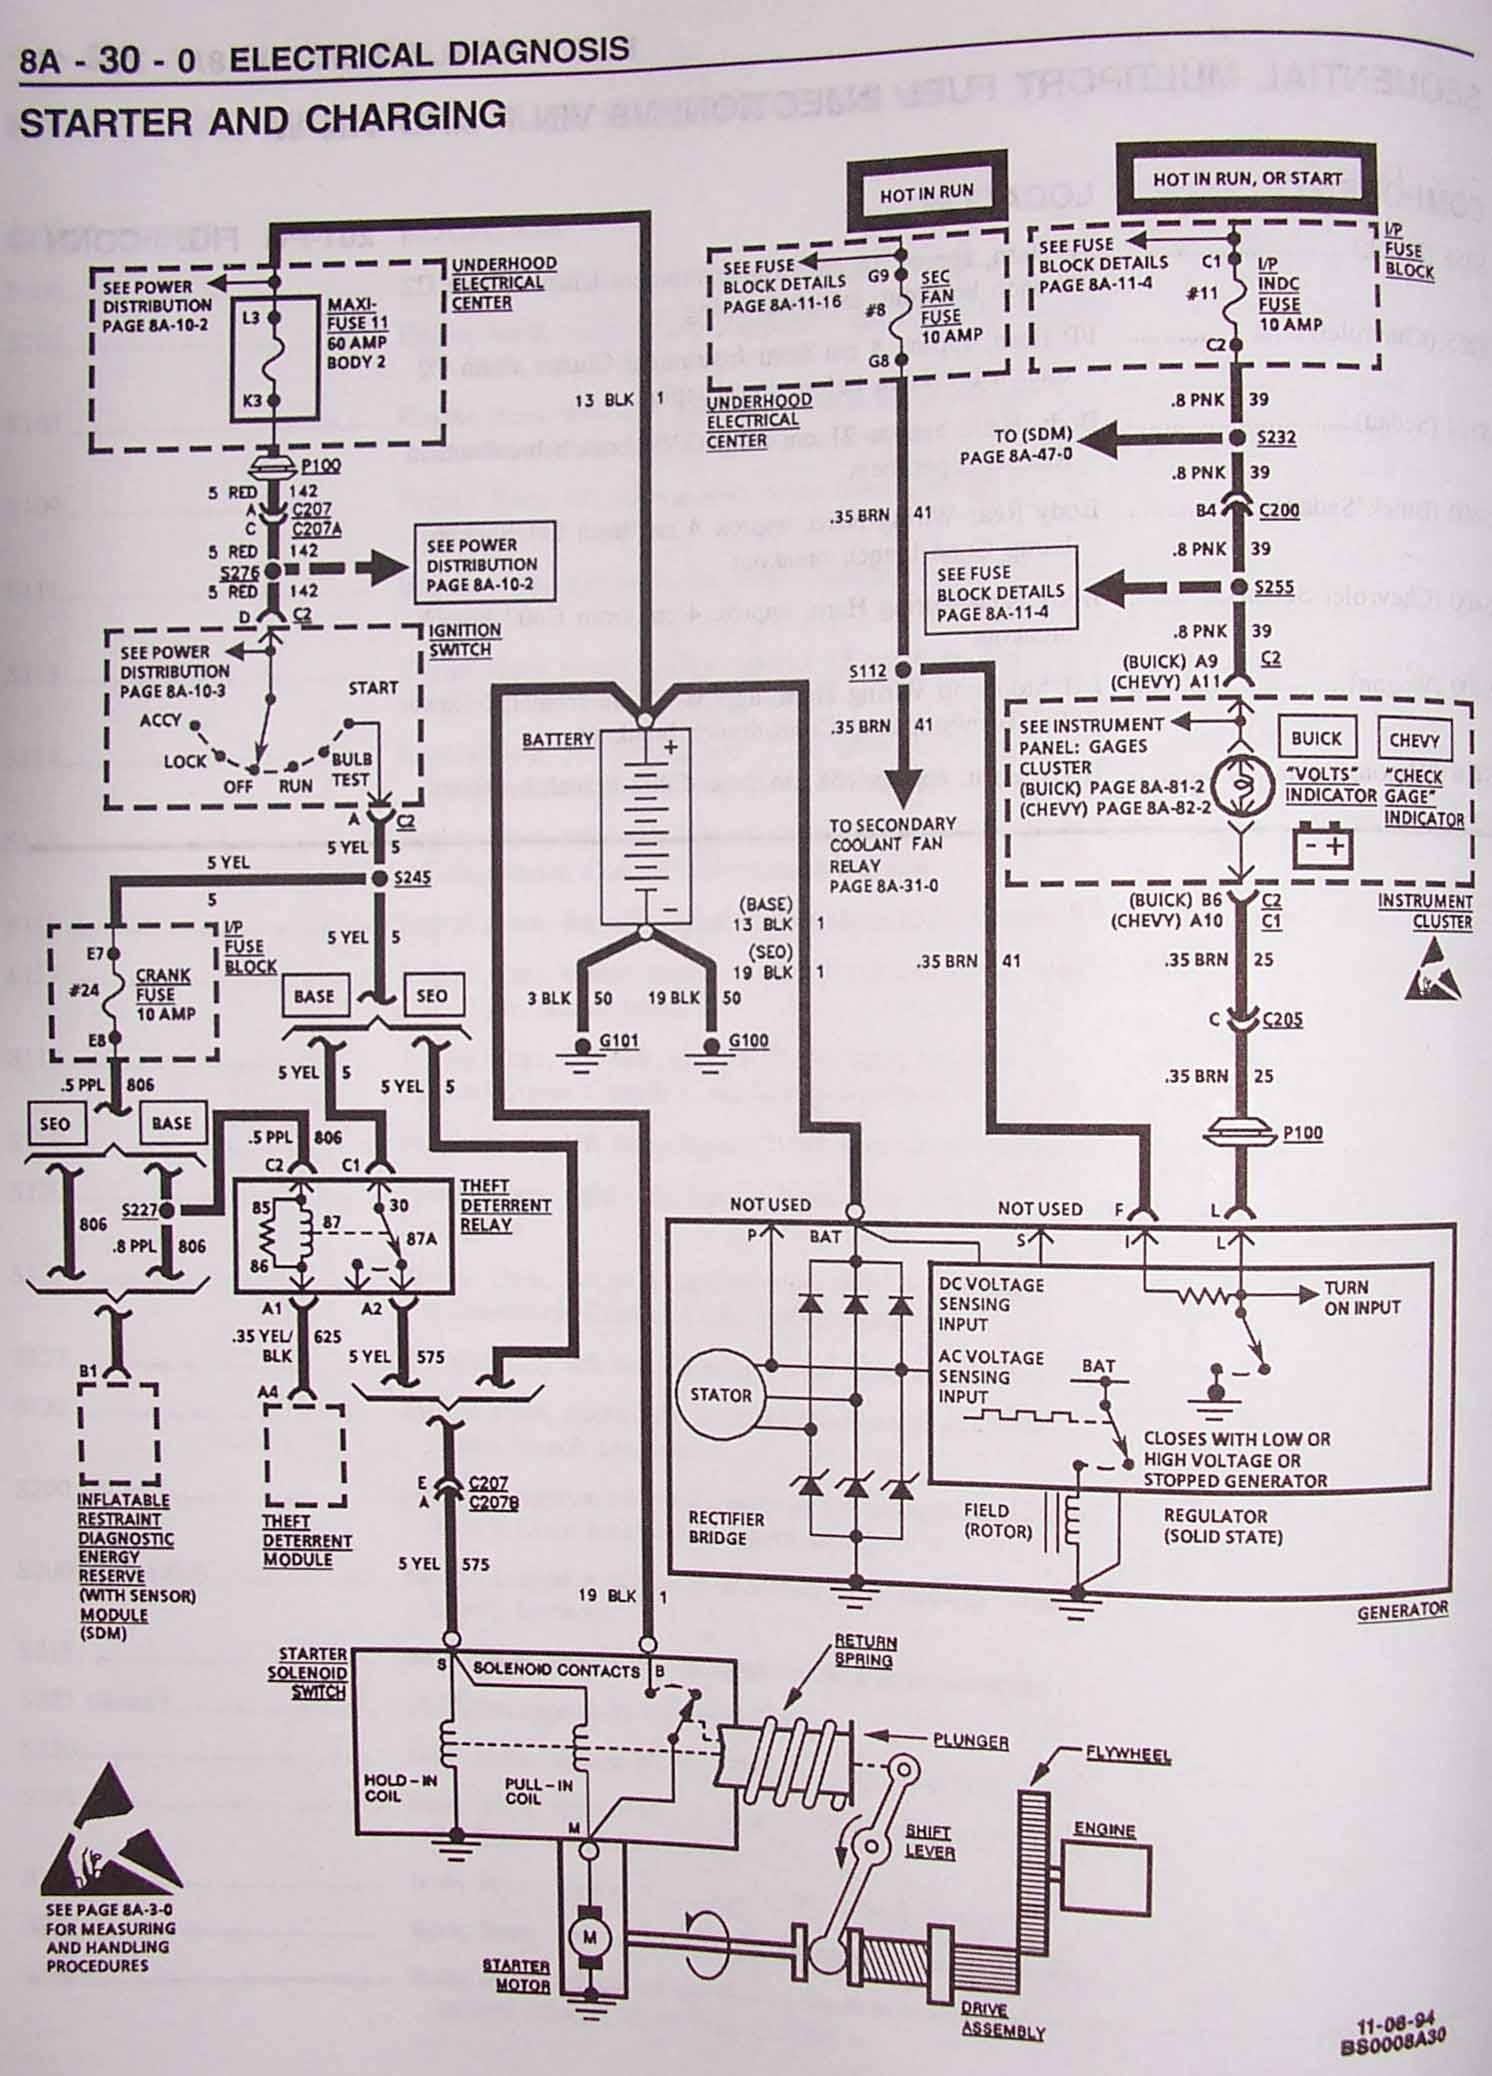 Fuse Diagram 1995 Pontiac Trans Am Lt1 Engine Wiring Diagrams Premium A Premium A Chatteriedelavalleedufelin Fr